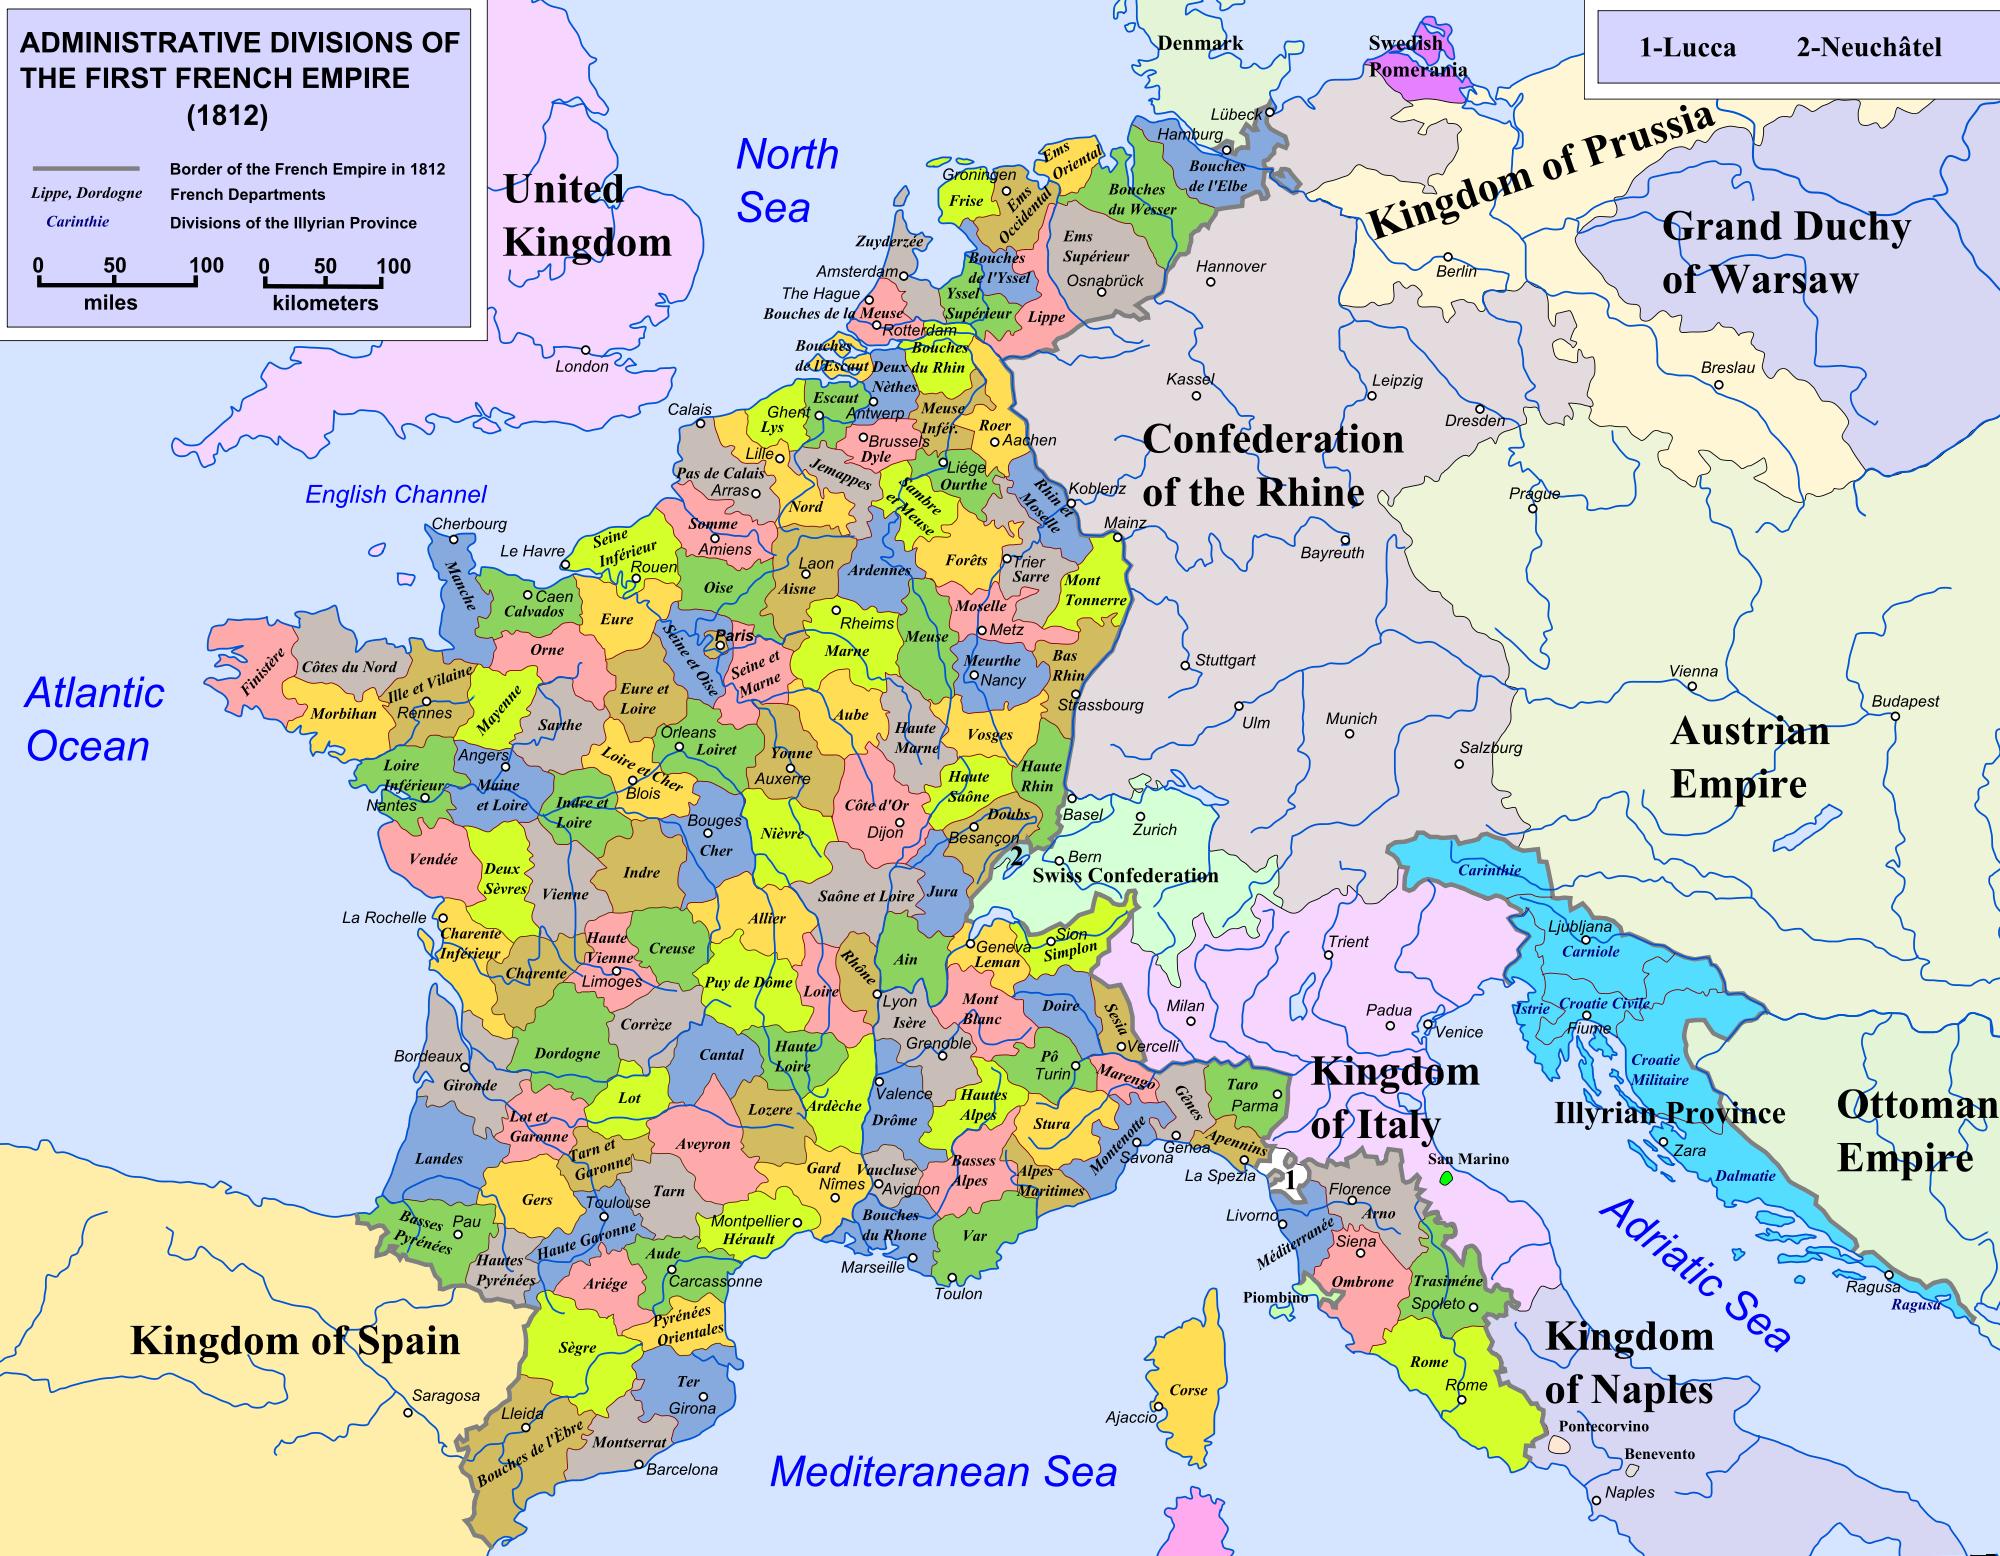 Napoleon France | De France Tweet Imprimer Cette Carte encequiconcerne Carte D Europe À Imprimer